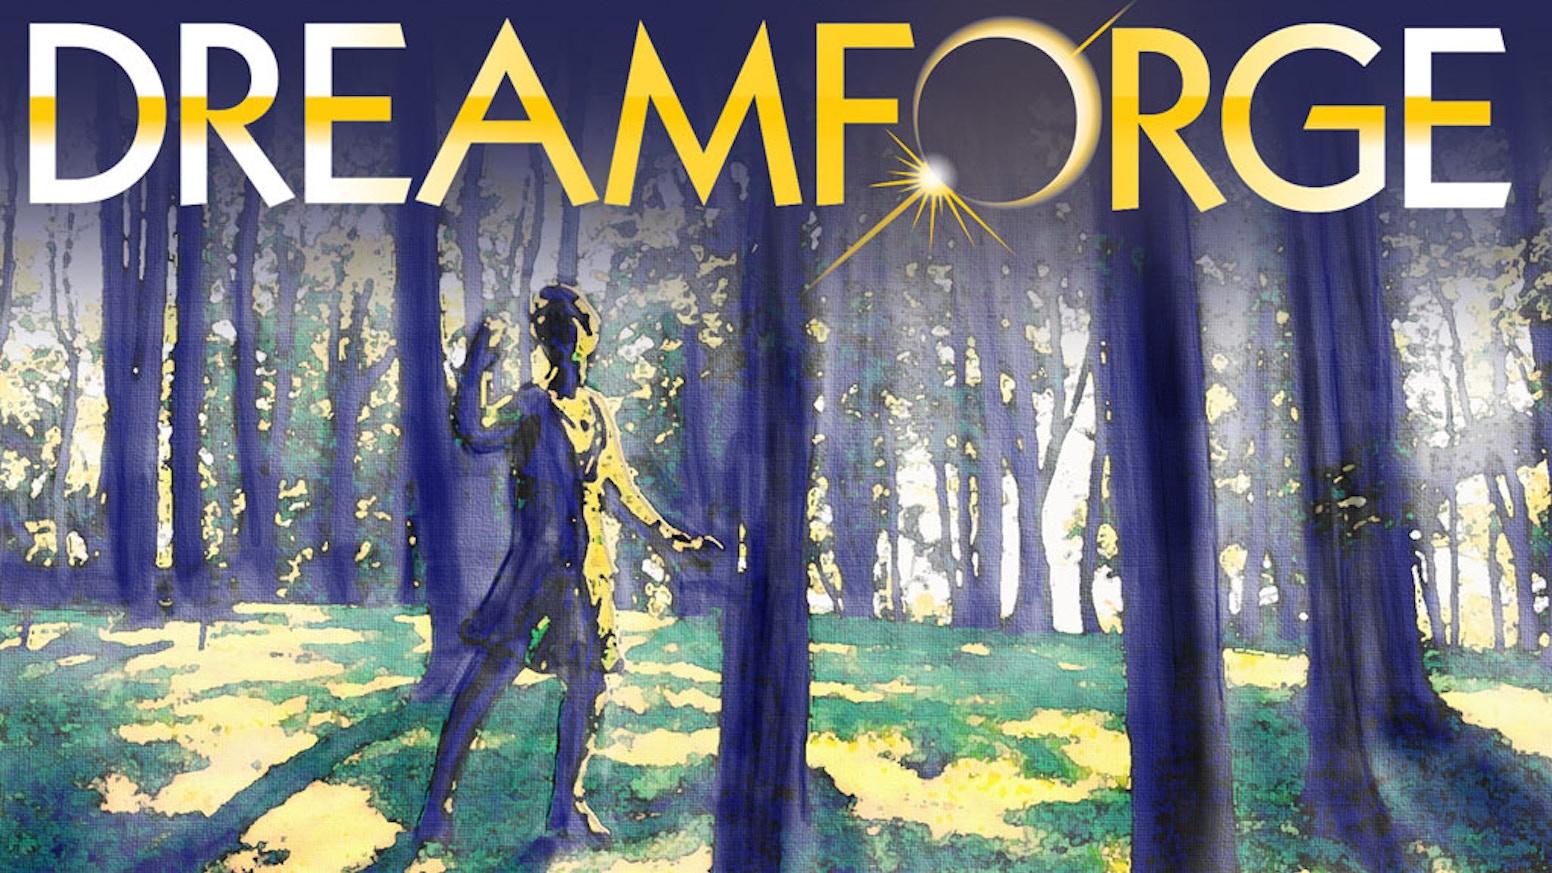 Help Launch DreamForge Magazine by Scot M Noel » DreamForge